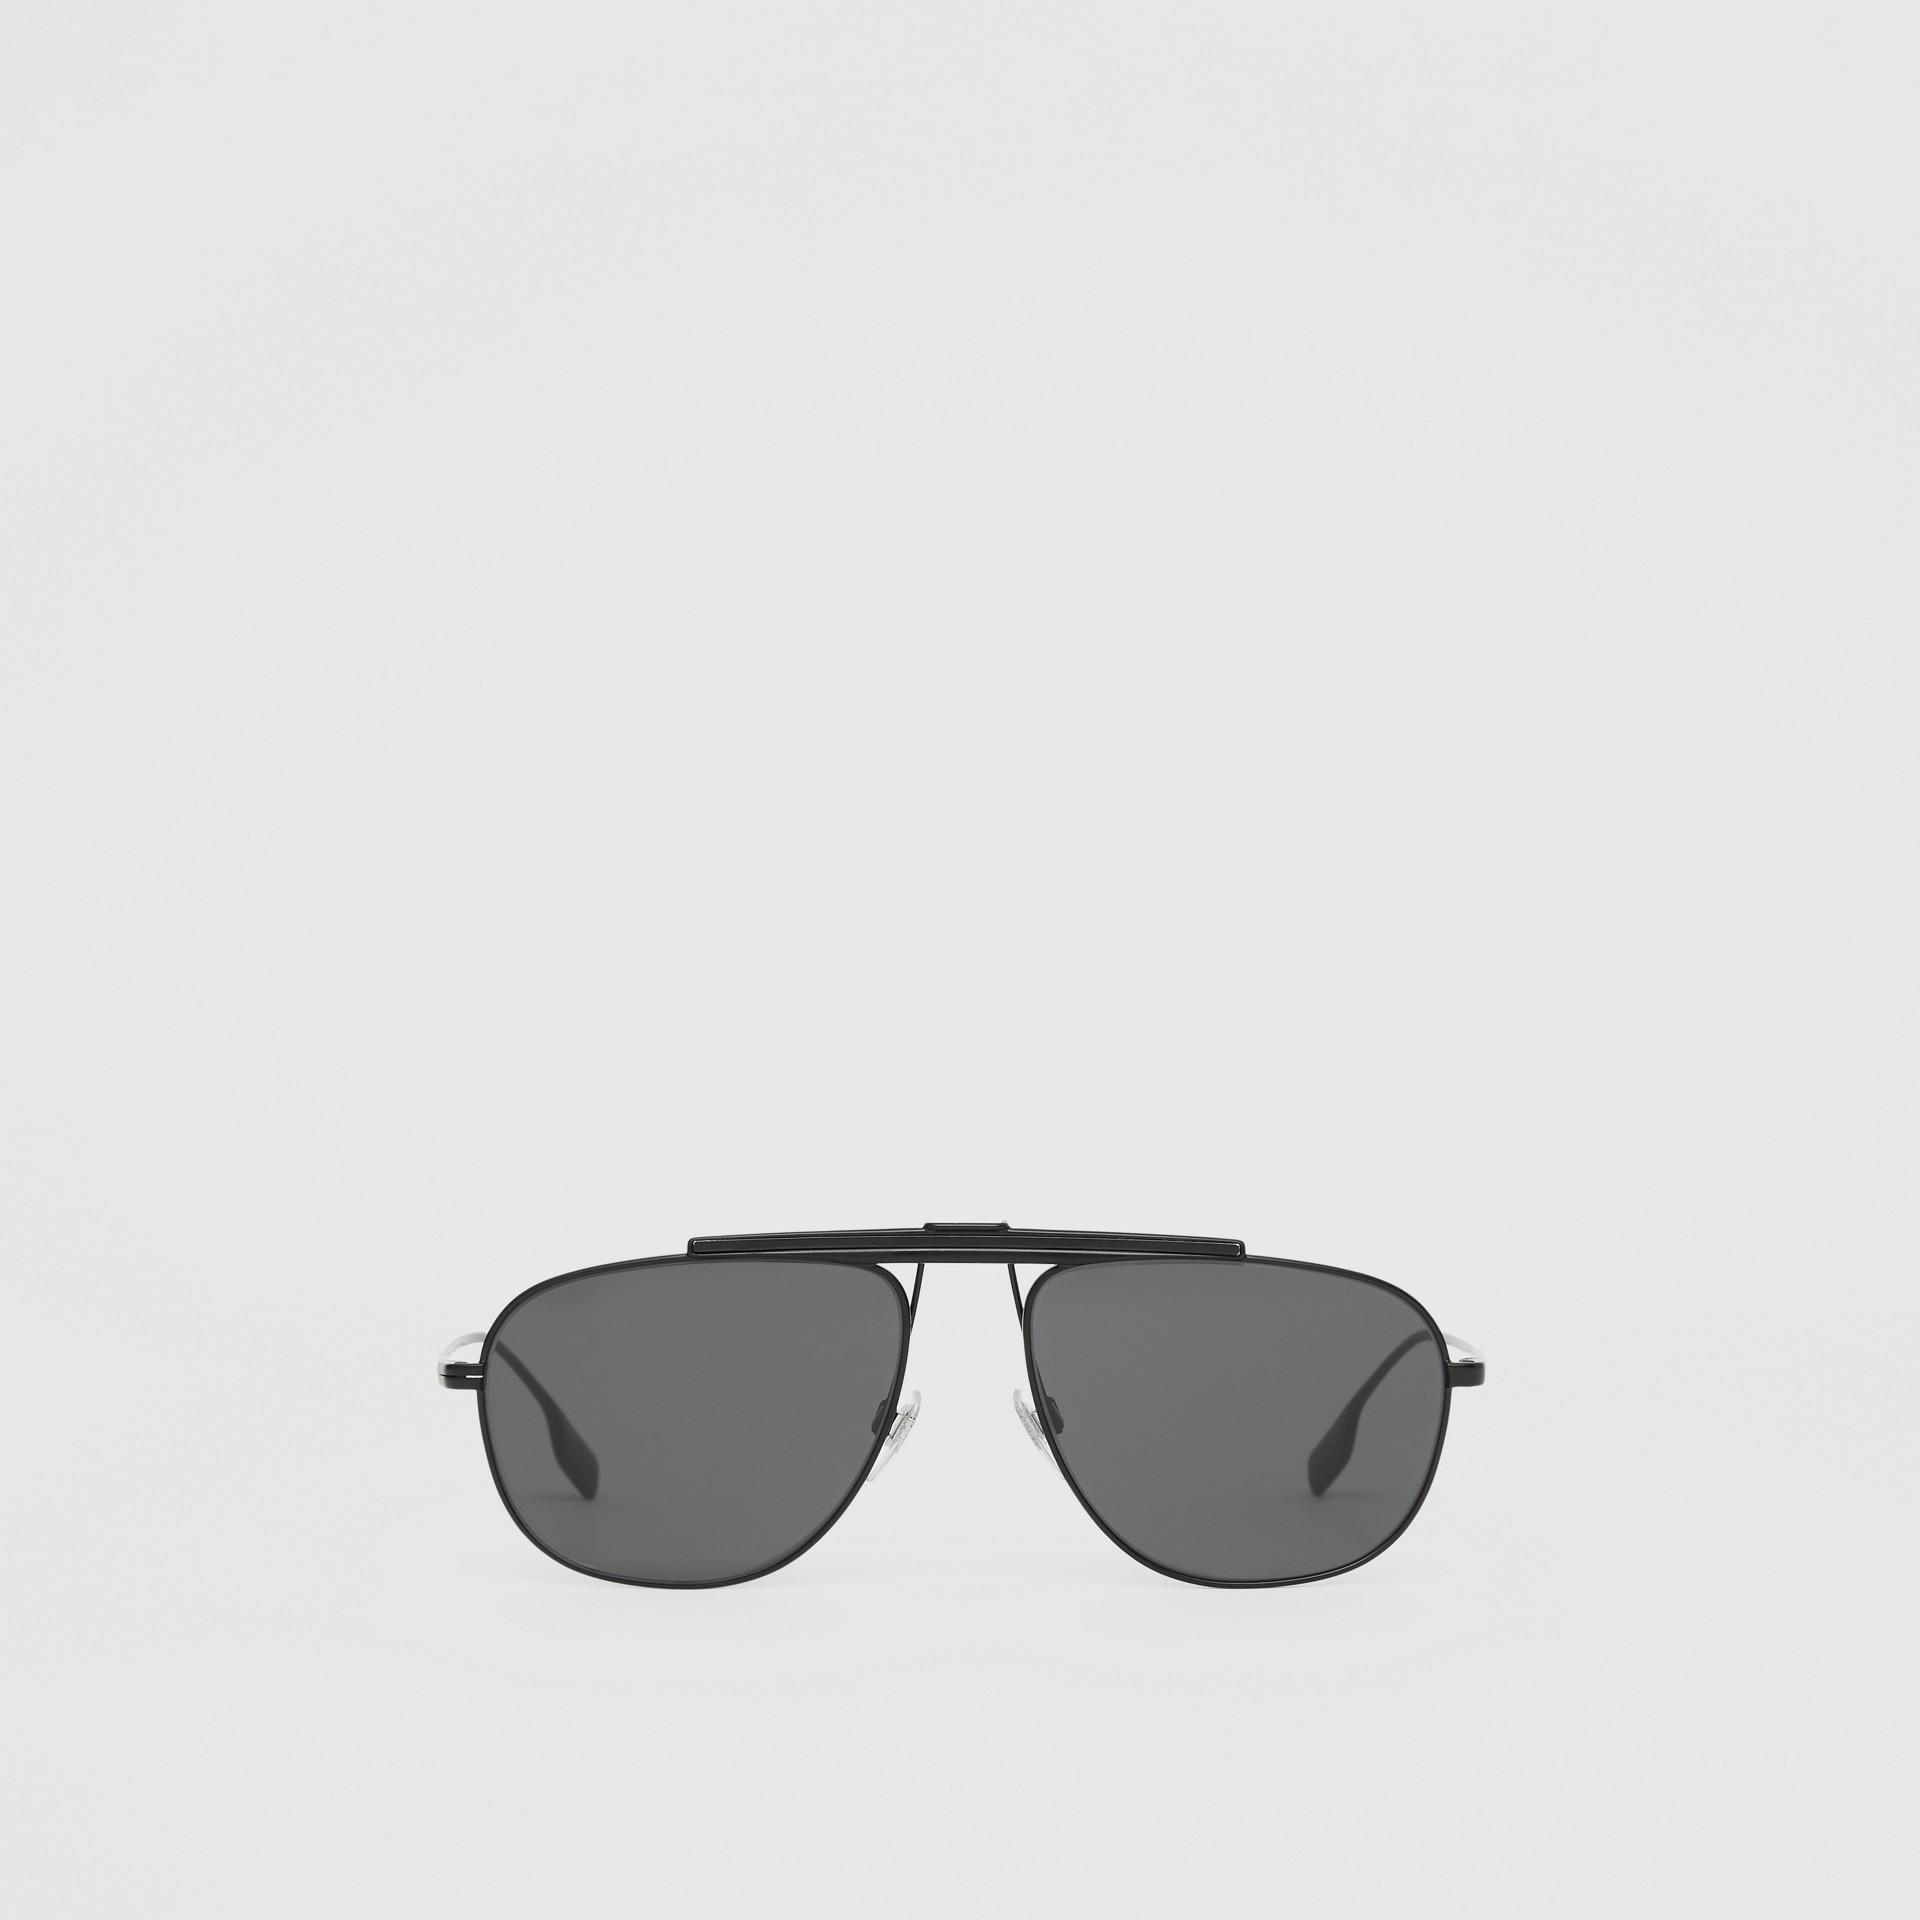 Pilot Sunglasses in Matte Black - Men | Burberry - gallery image 0